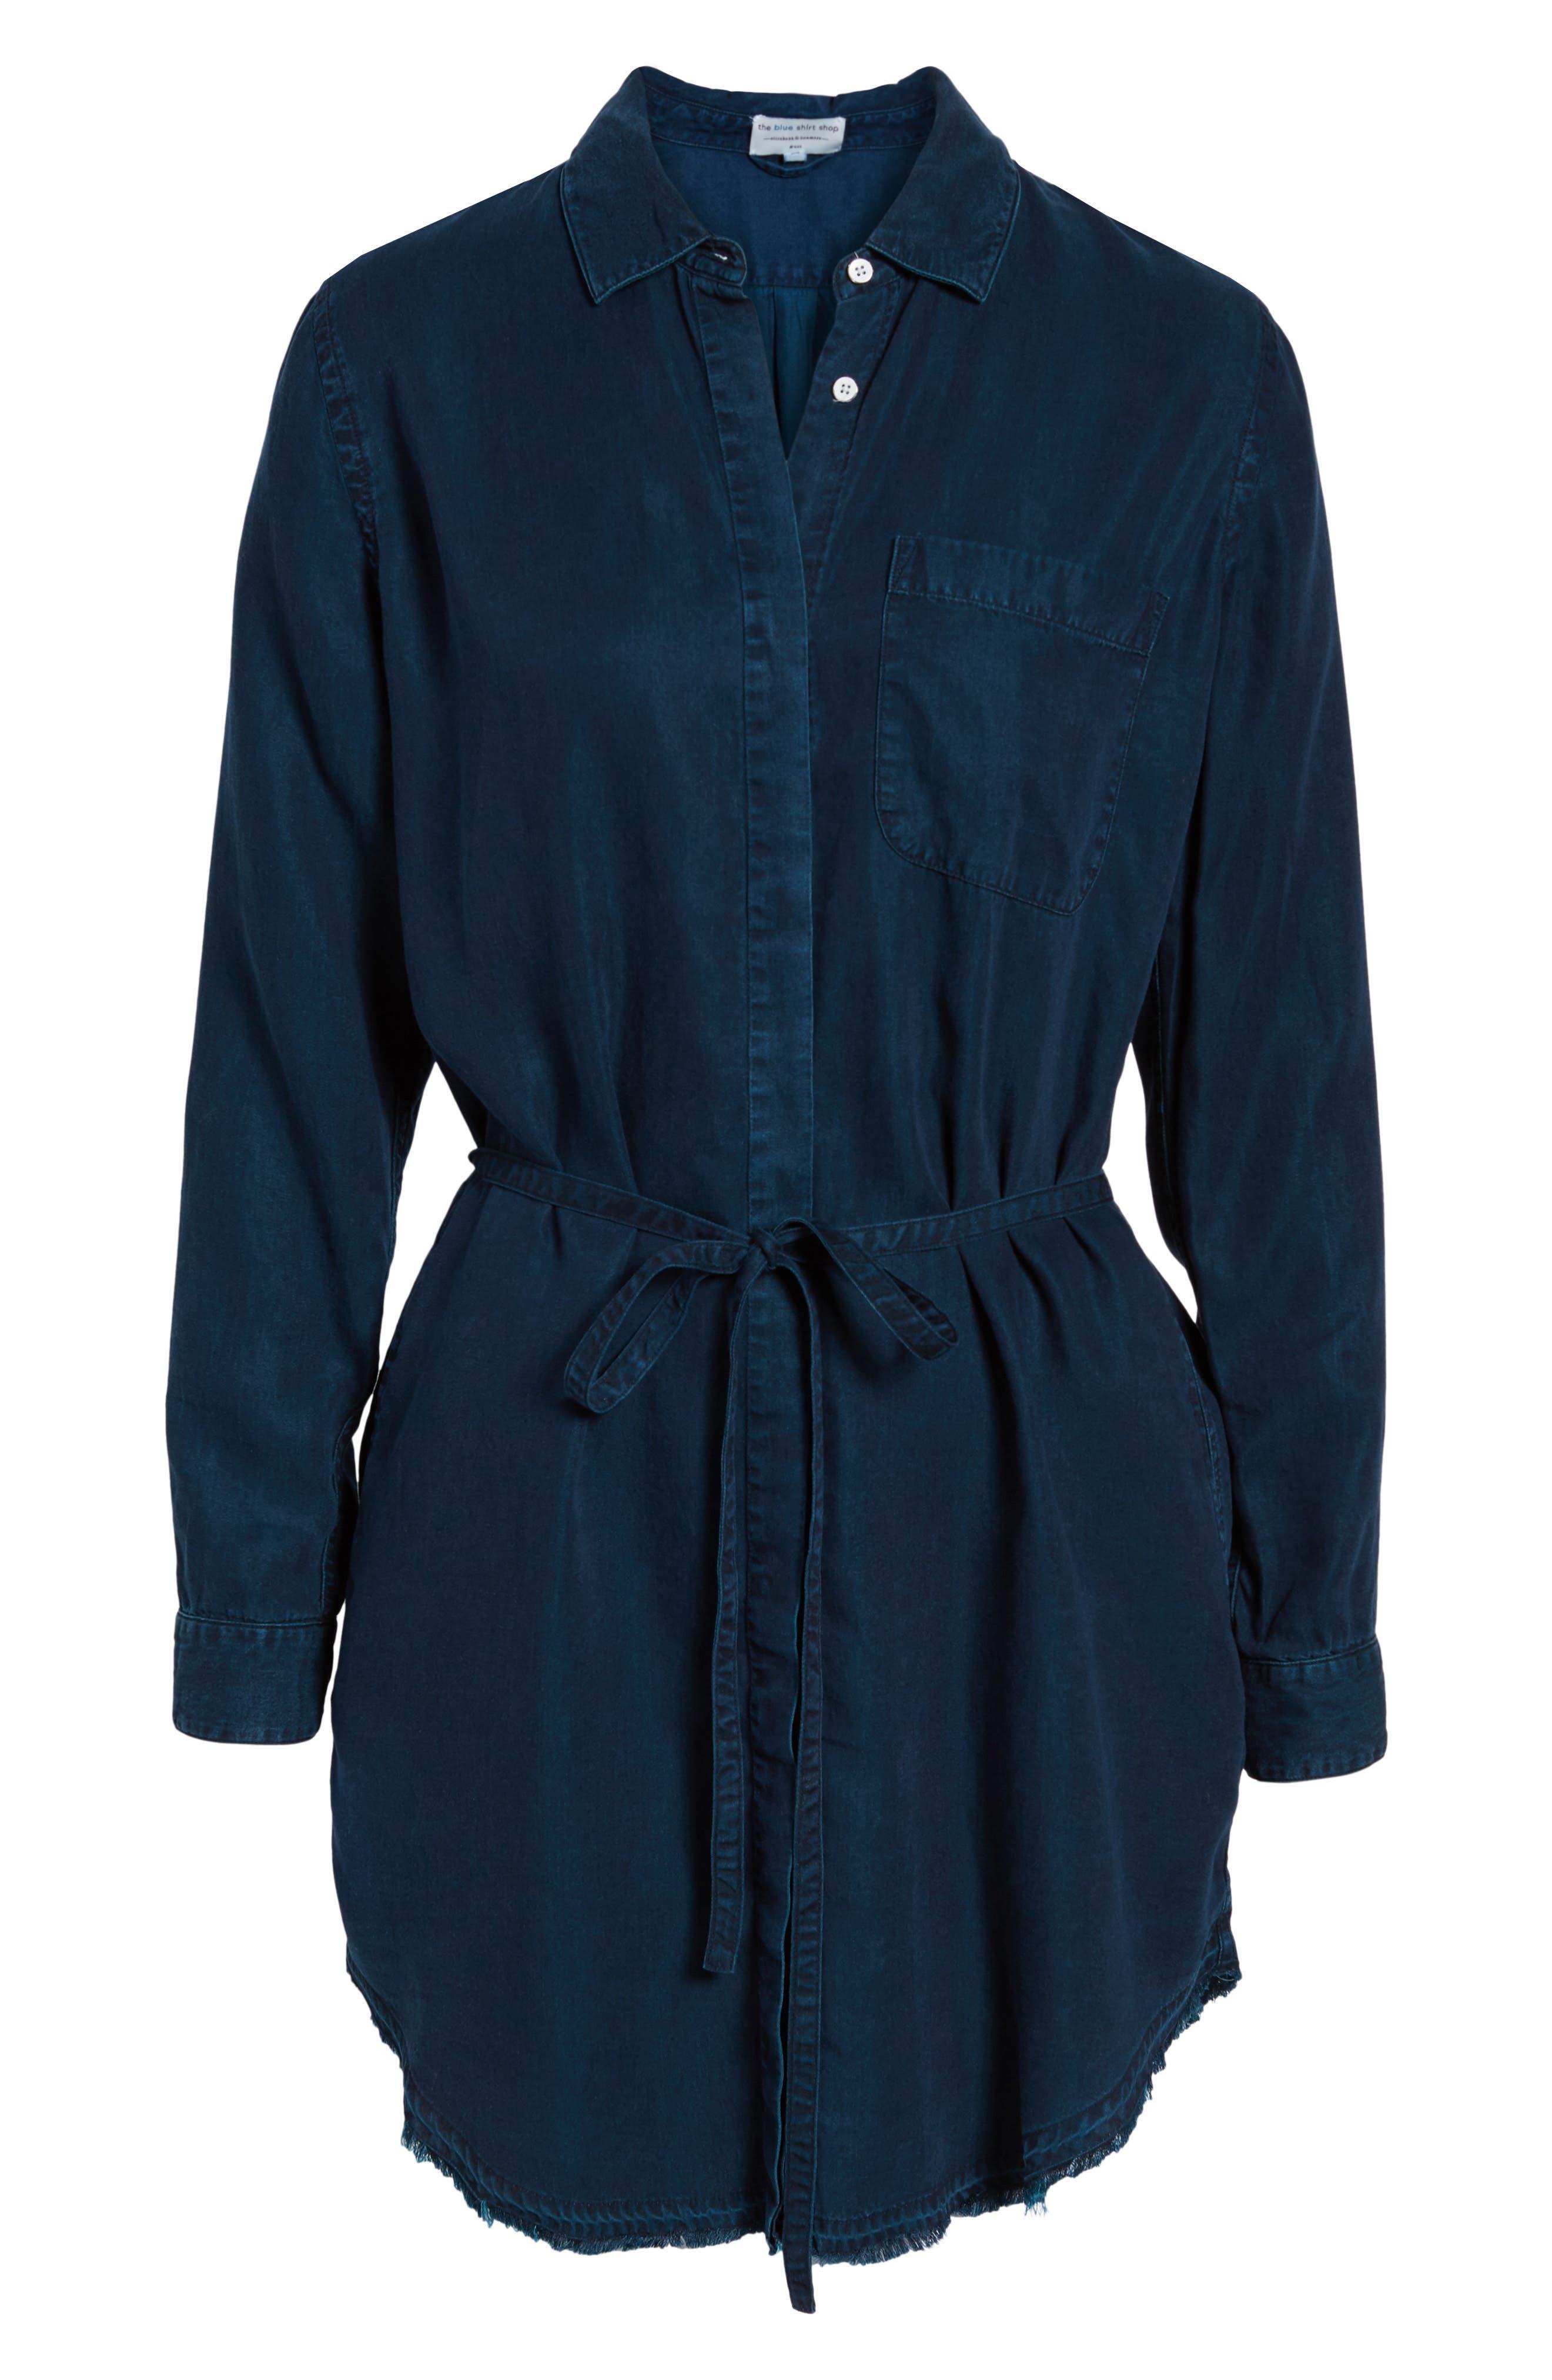 Elizabeth & Kenmare Shirtdress,                             Alternate thumbnail 6, color,                             Indigo Overdye